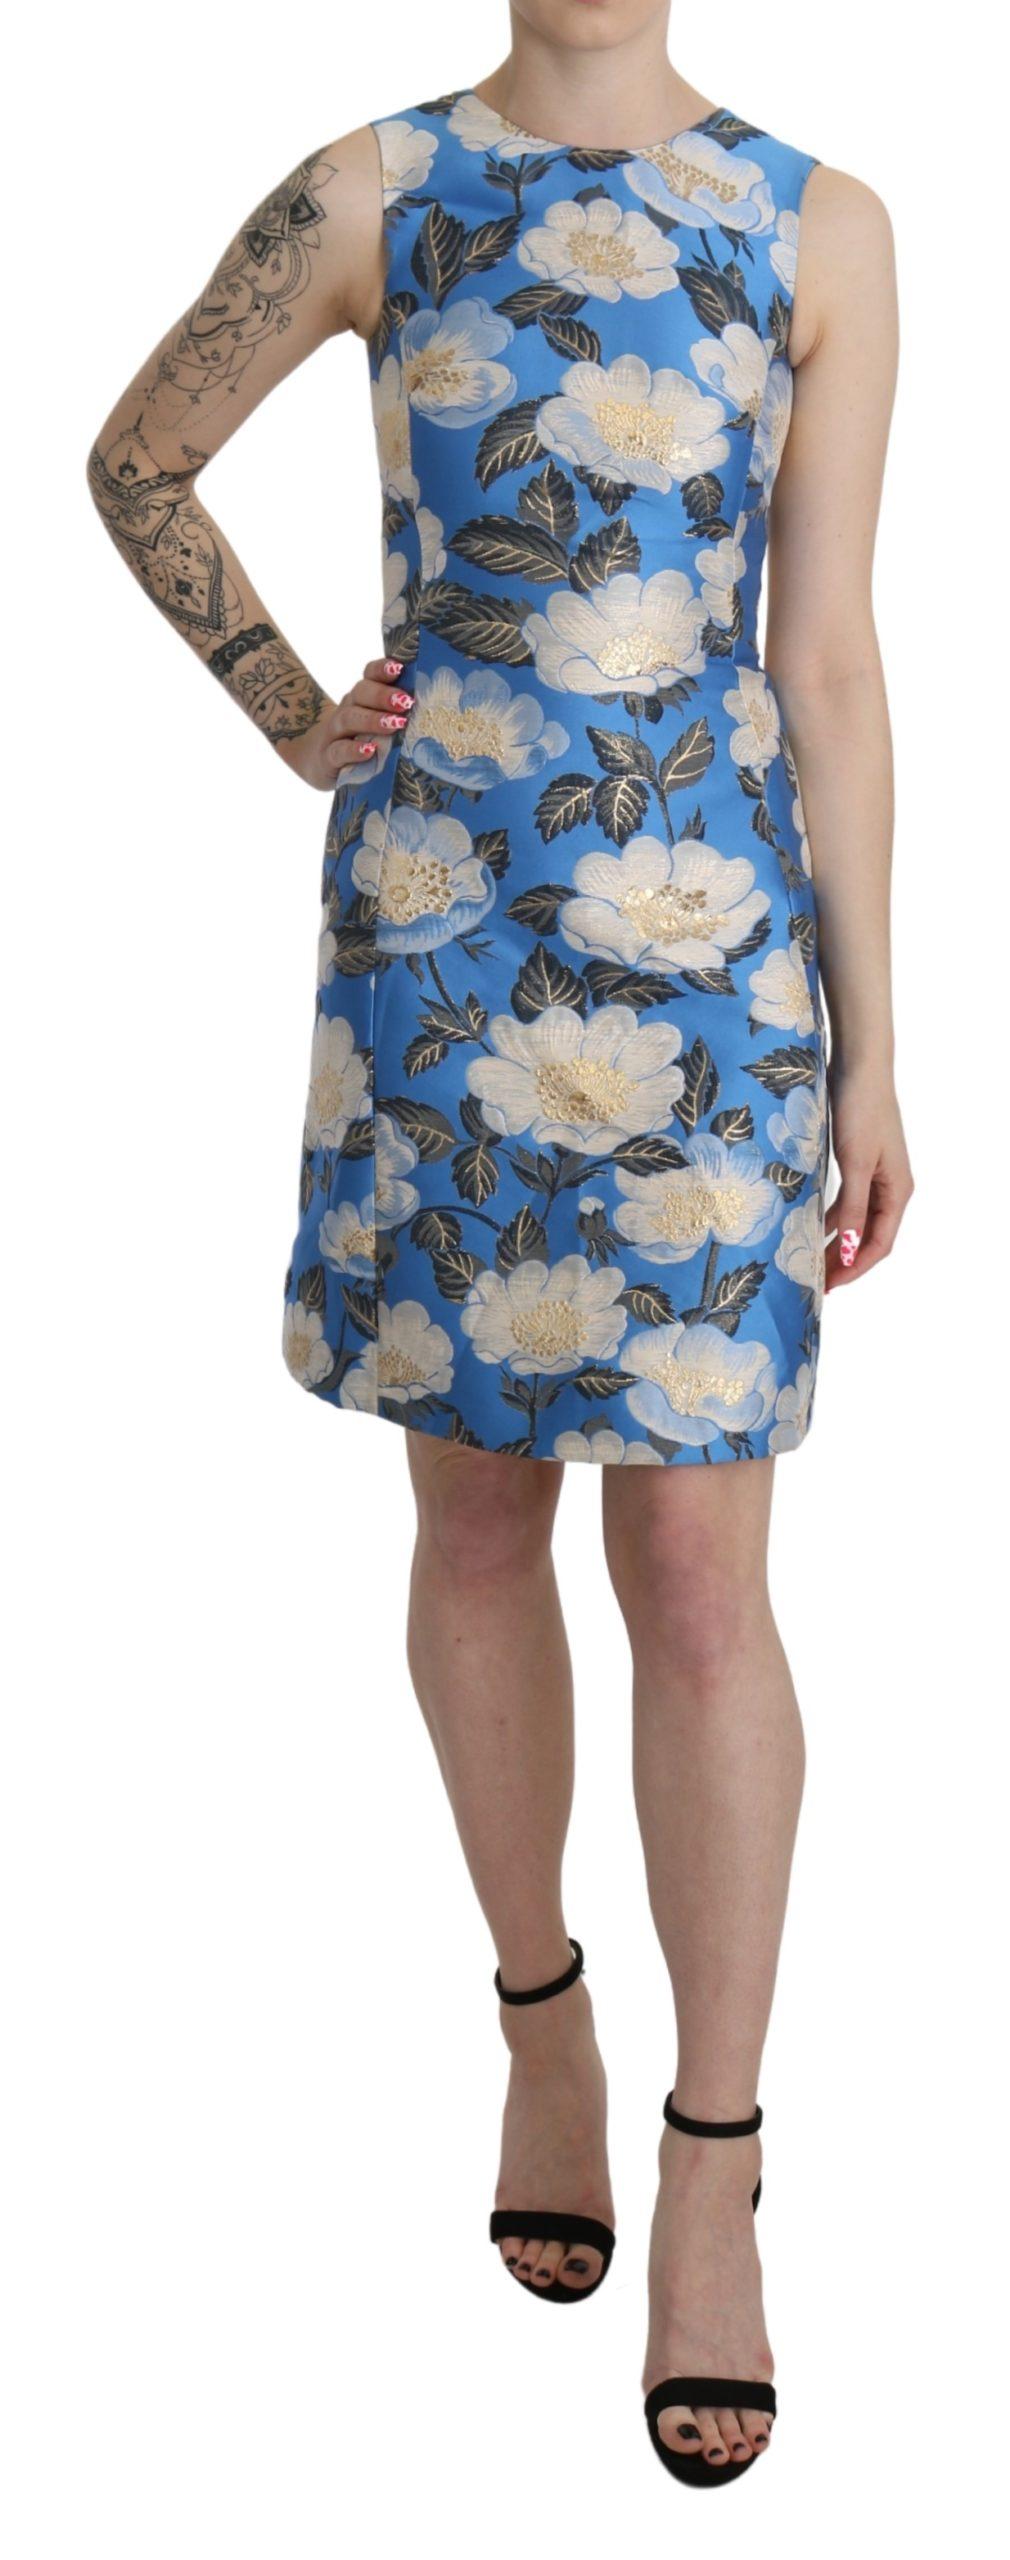 Dolce & Gabbana Women's Jacquard Floral Mini Dress Blue DR2612 - IT36   XS